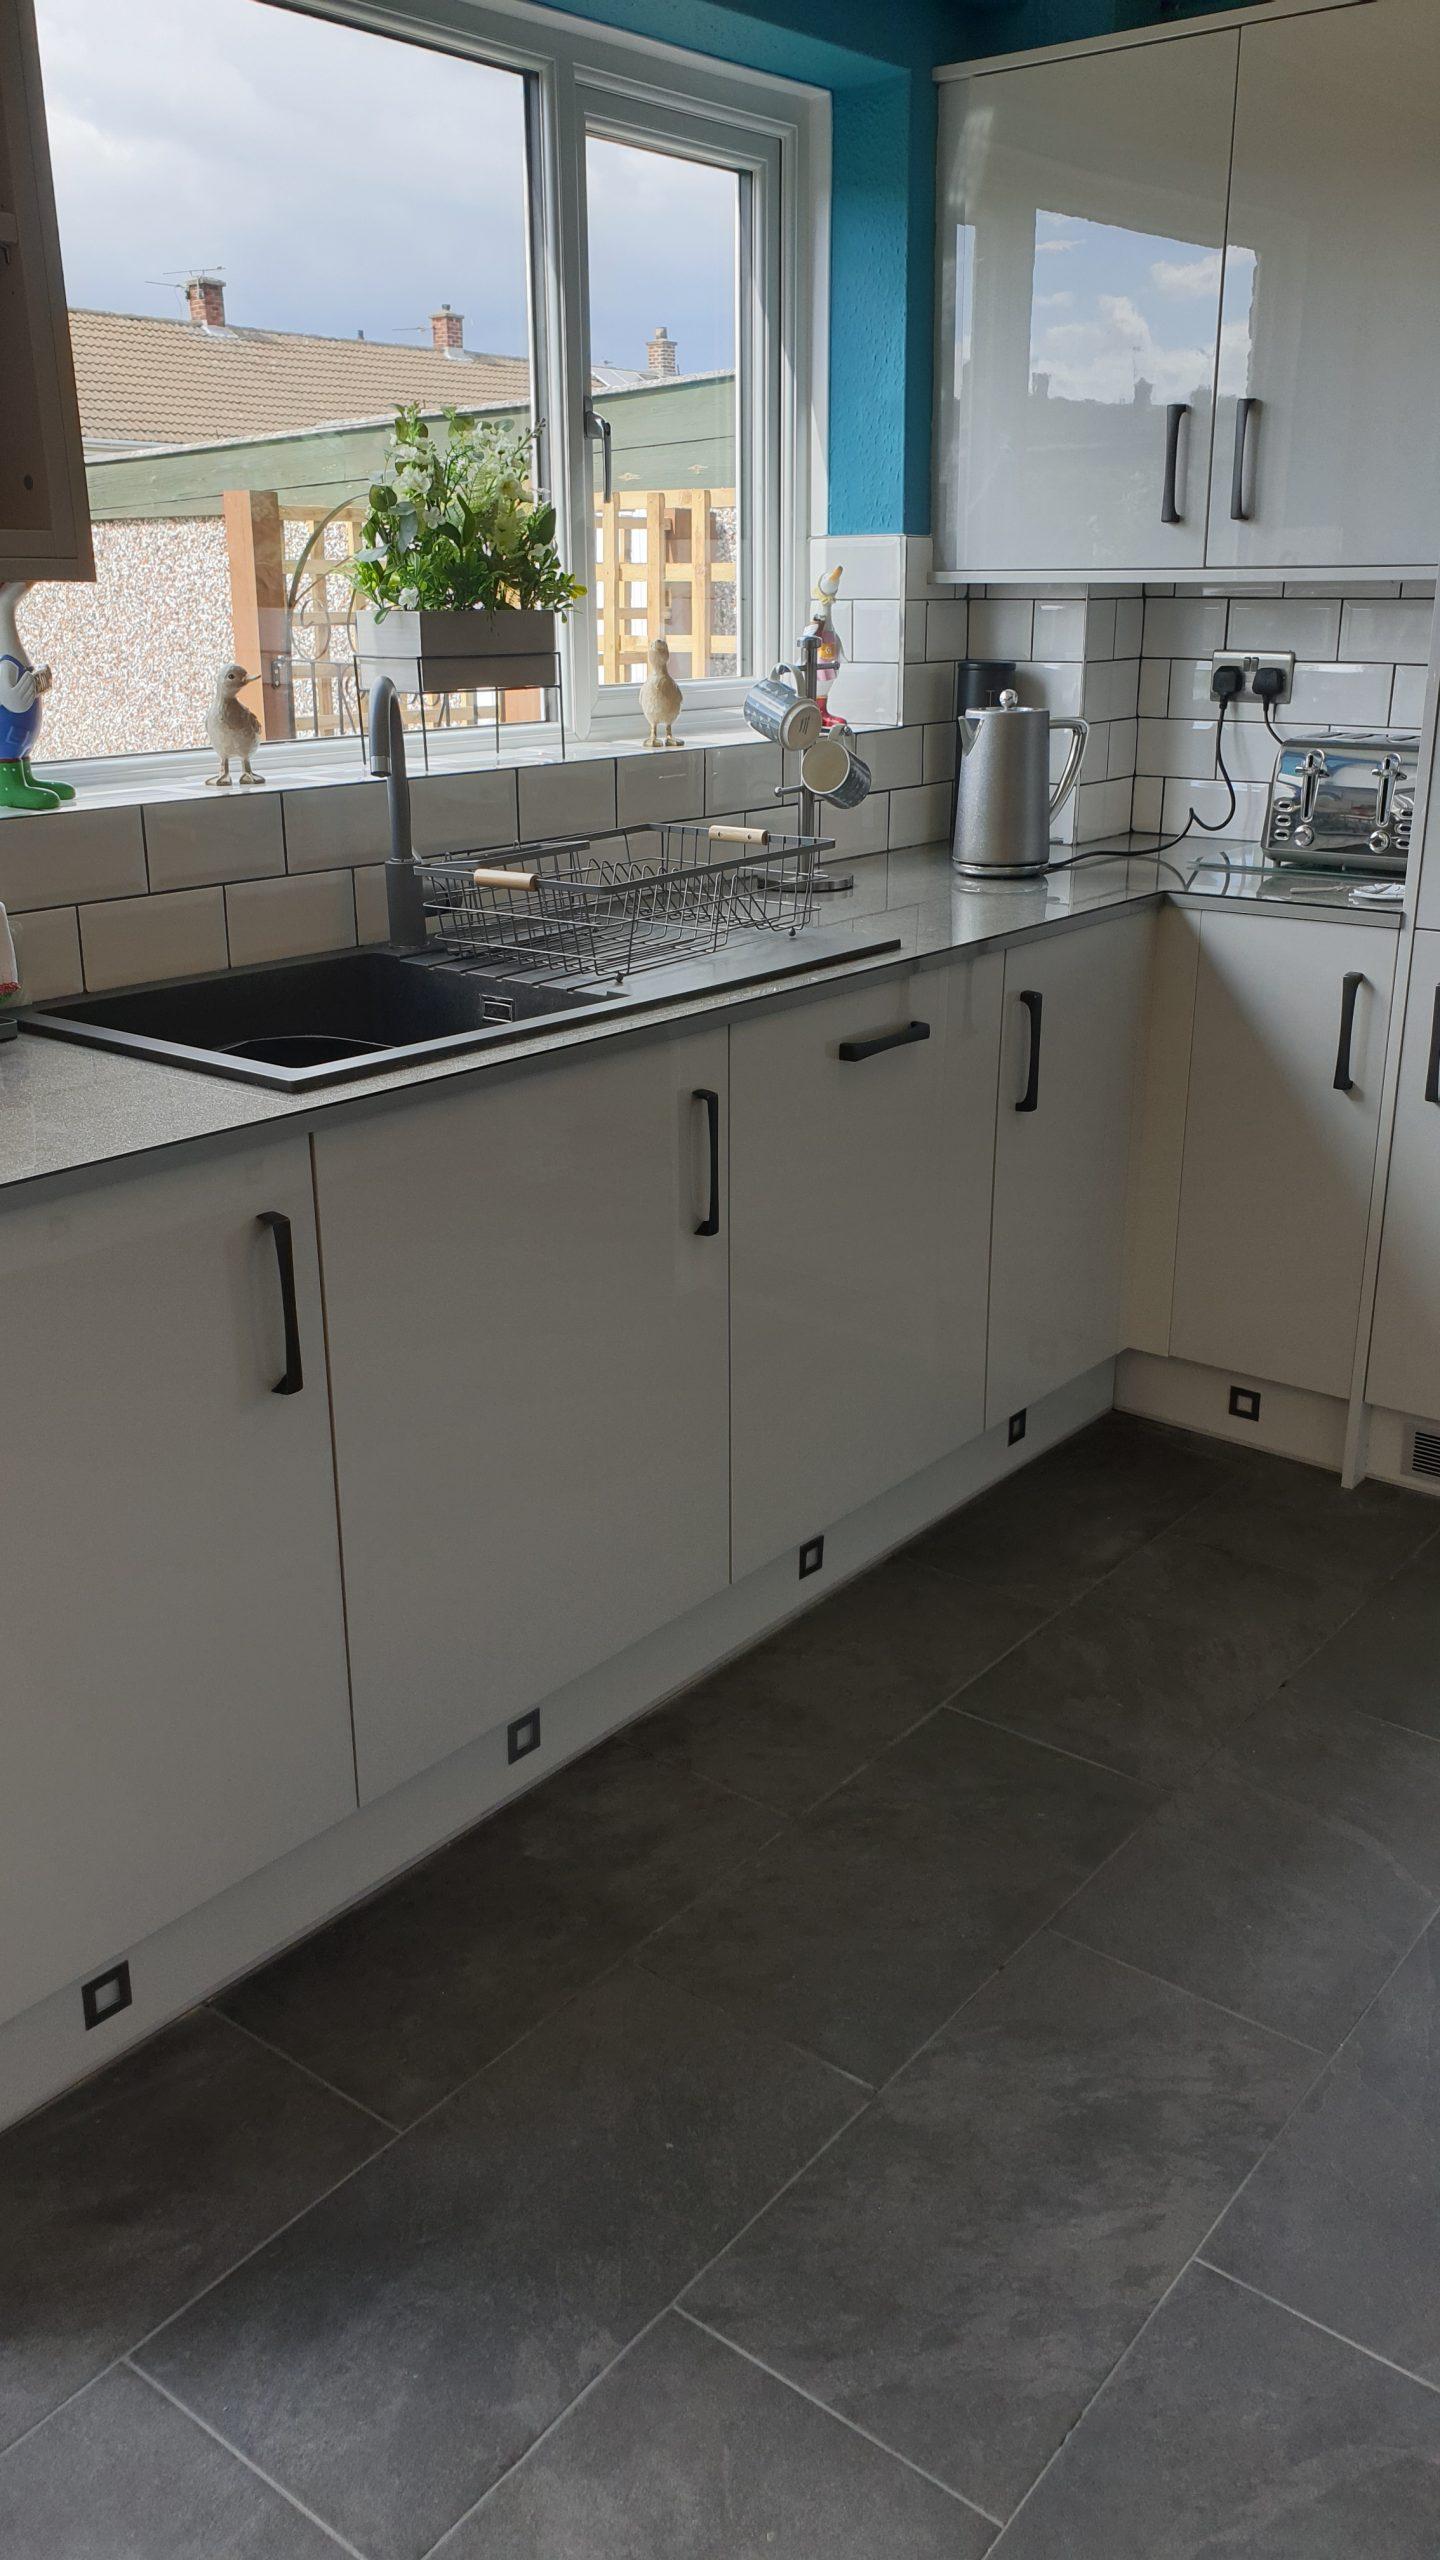 WREN Kitchen Installer | CL Joinery